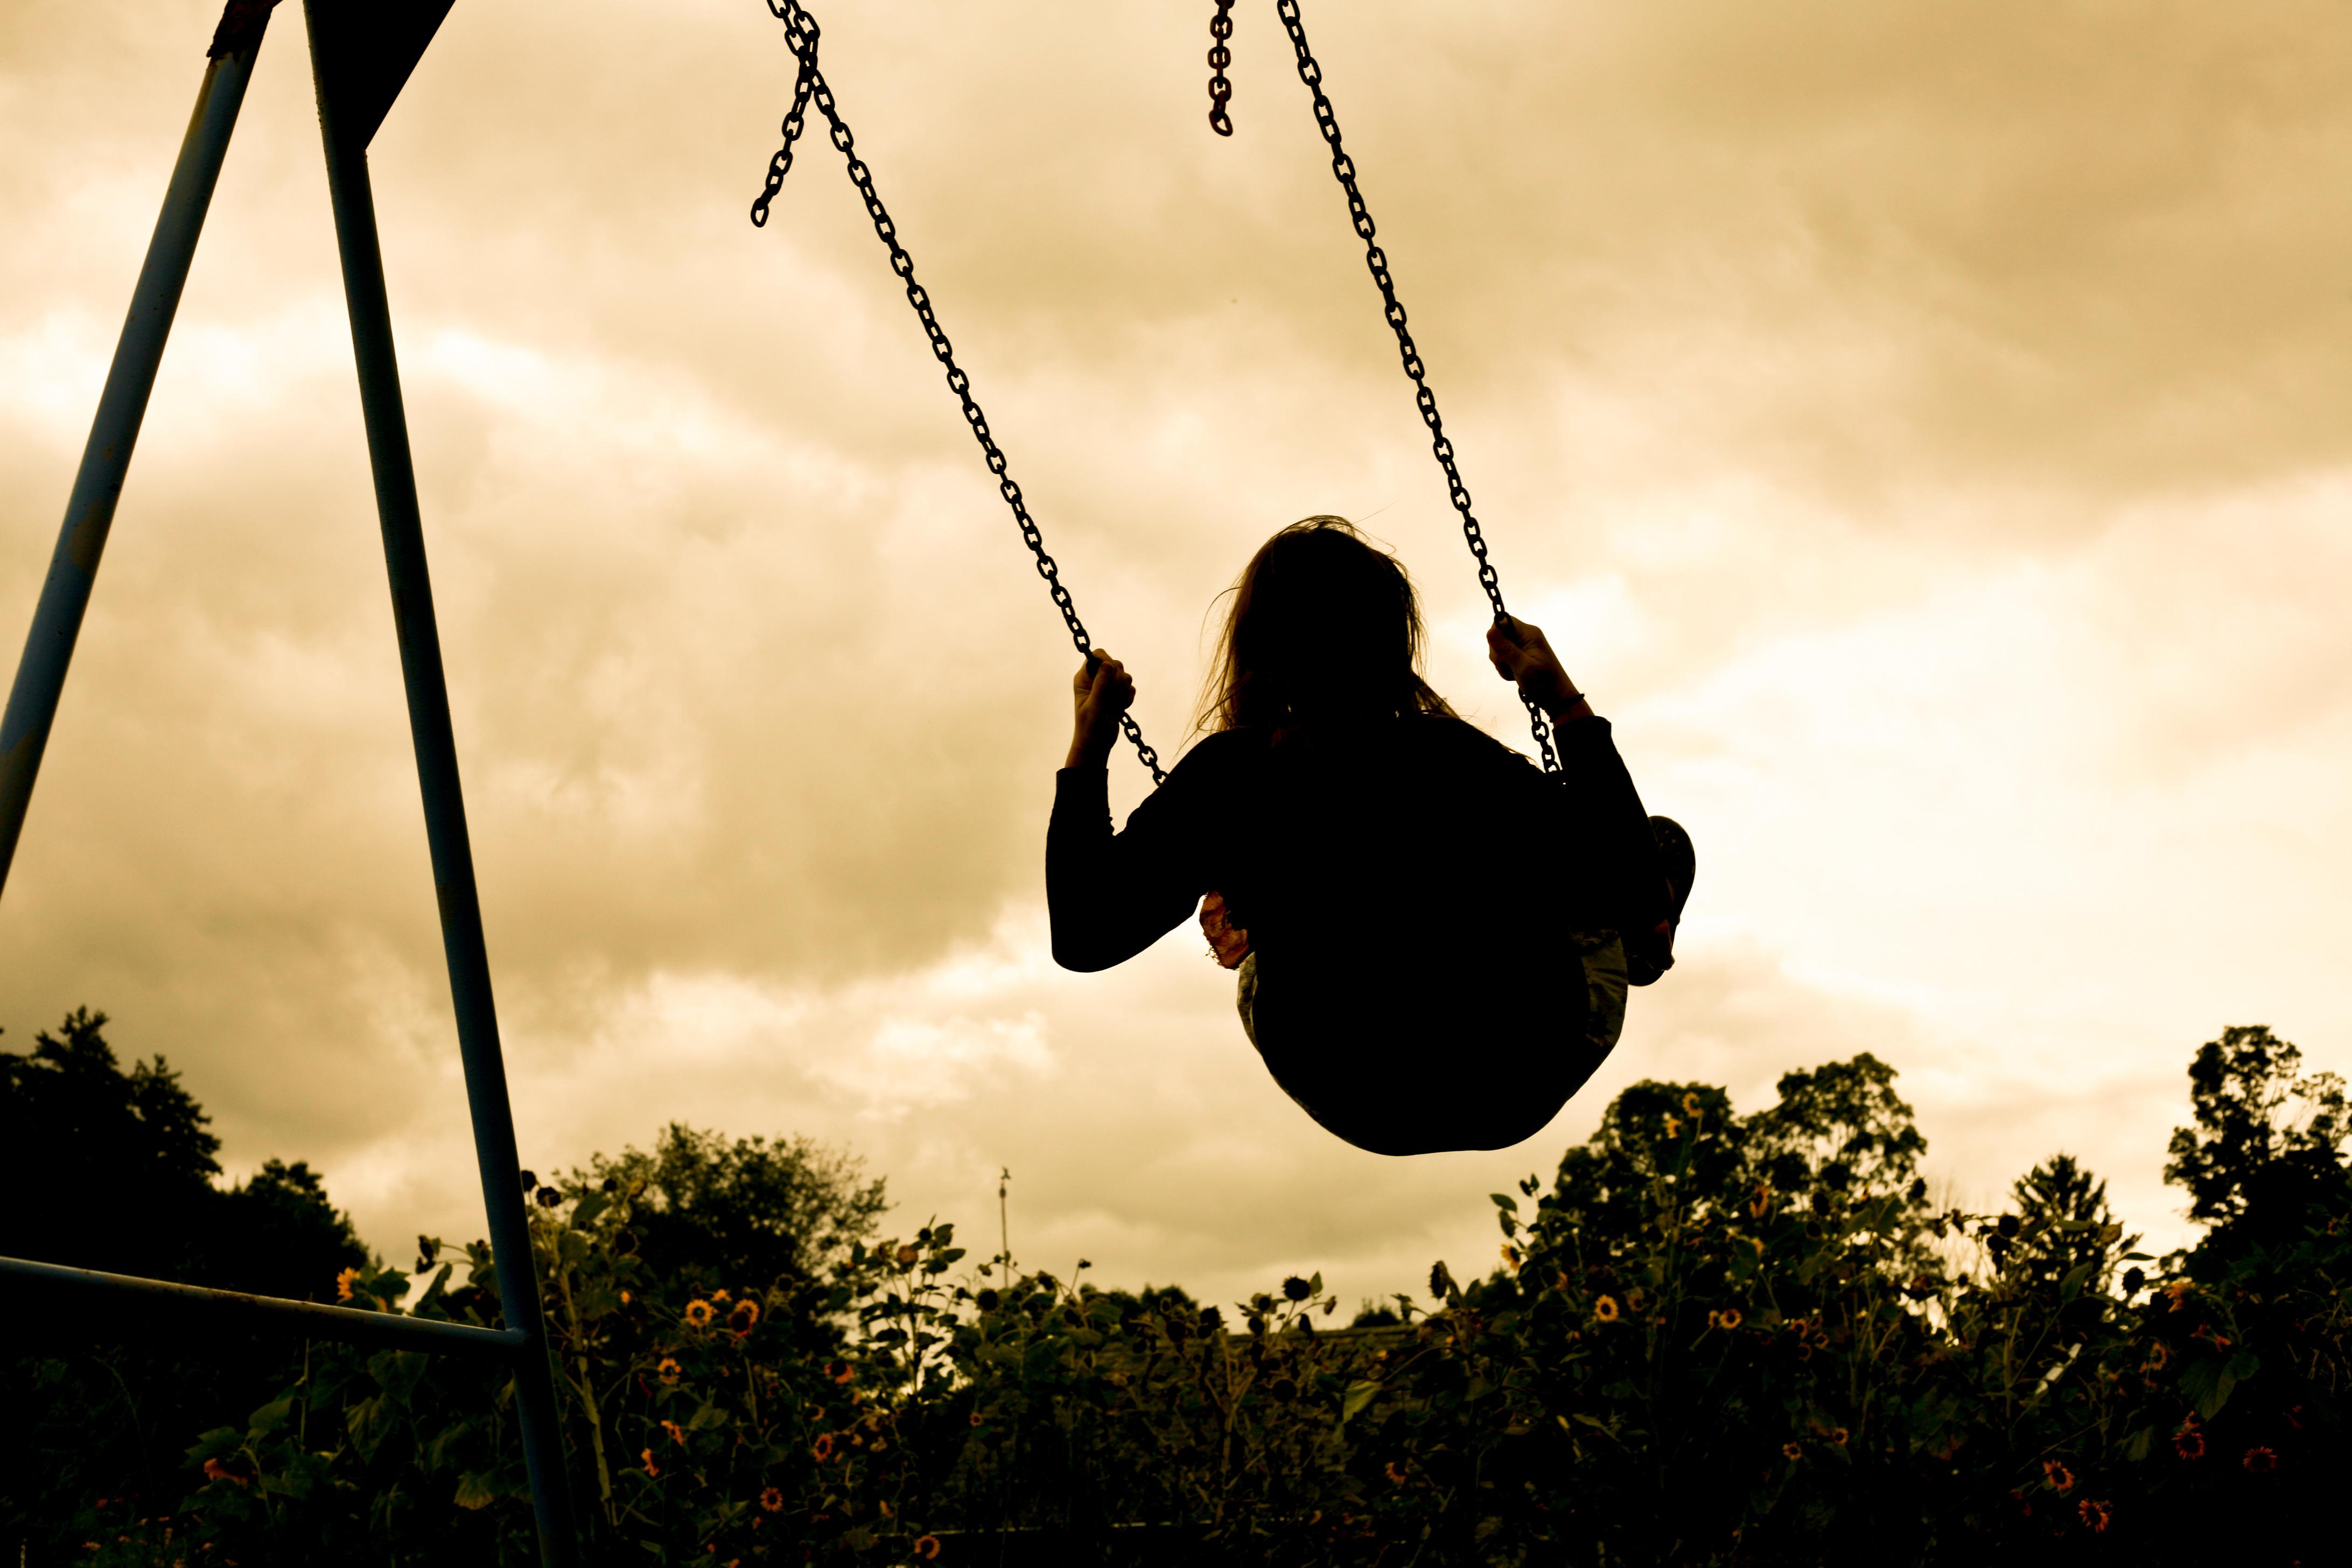 Swing High